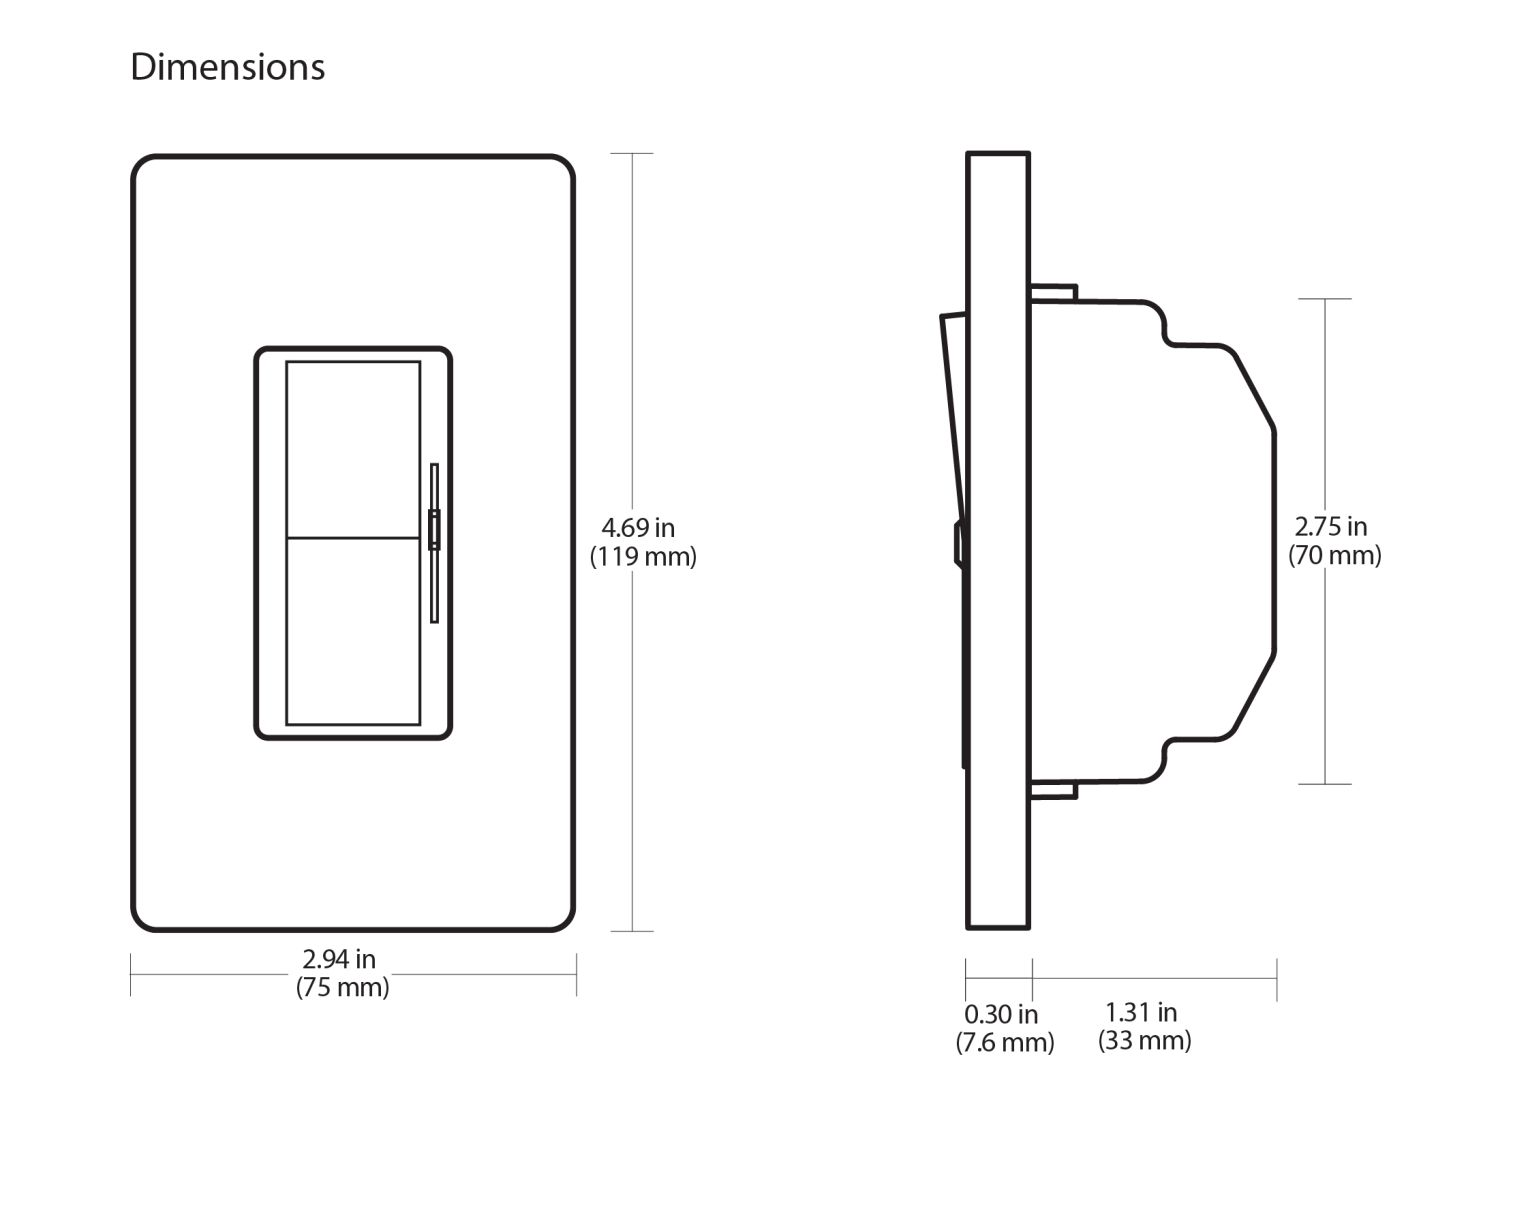 LED Dimmers, Sensors, and Controls